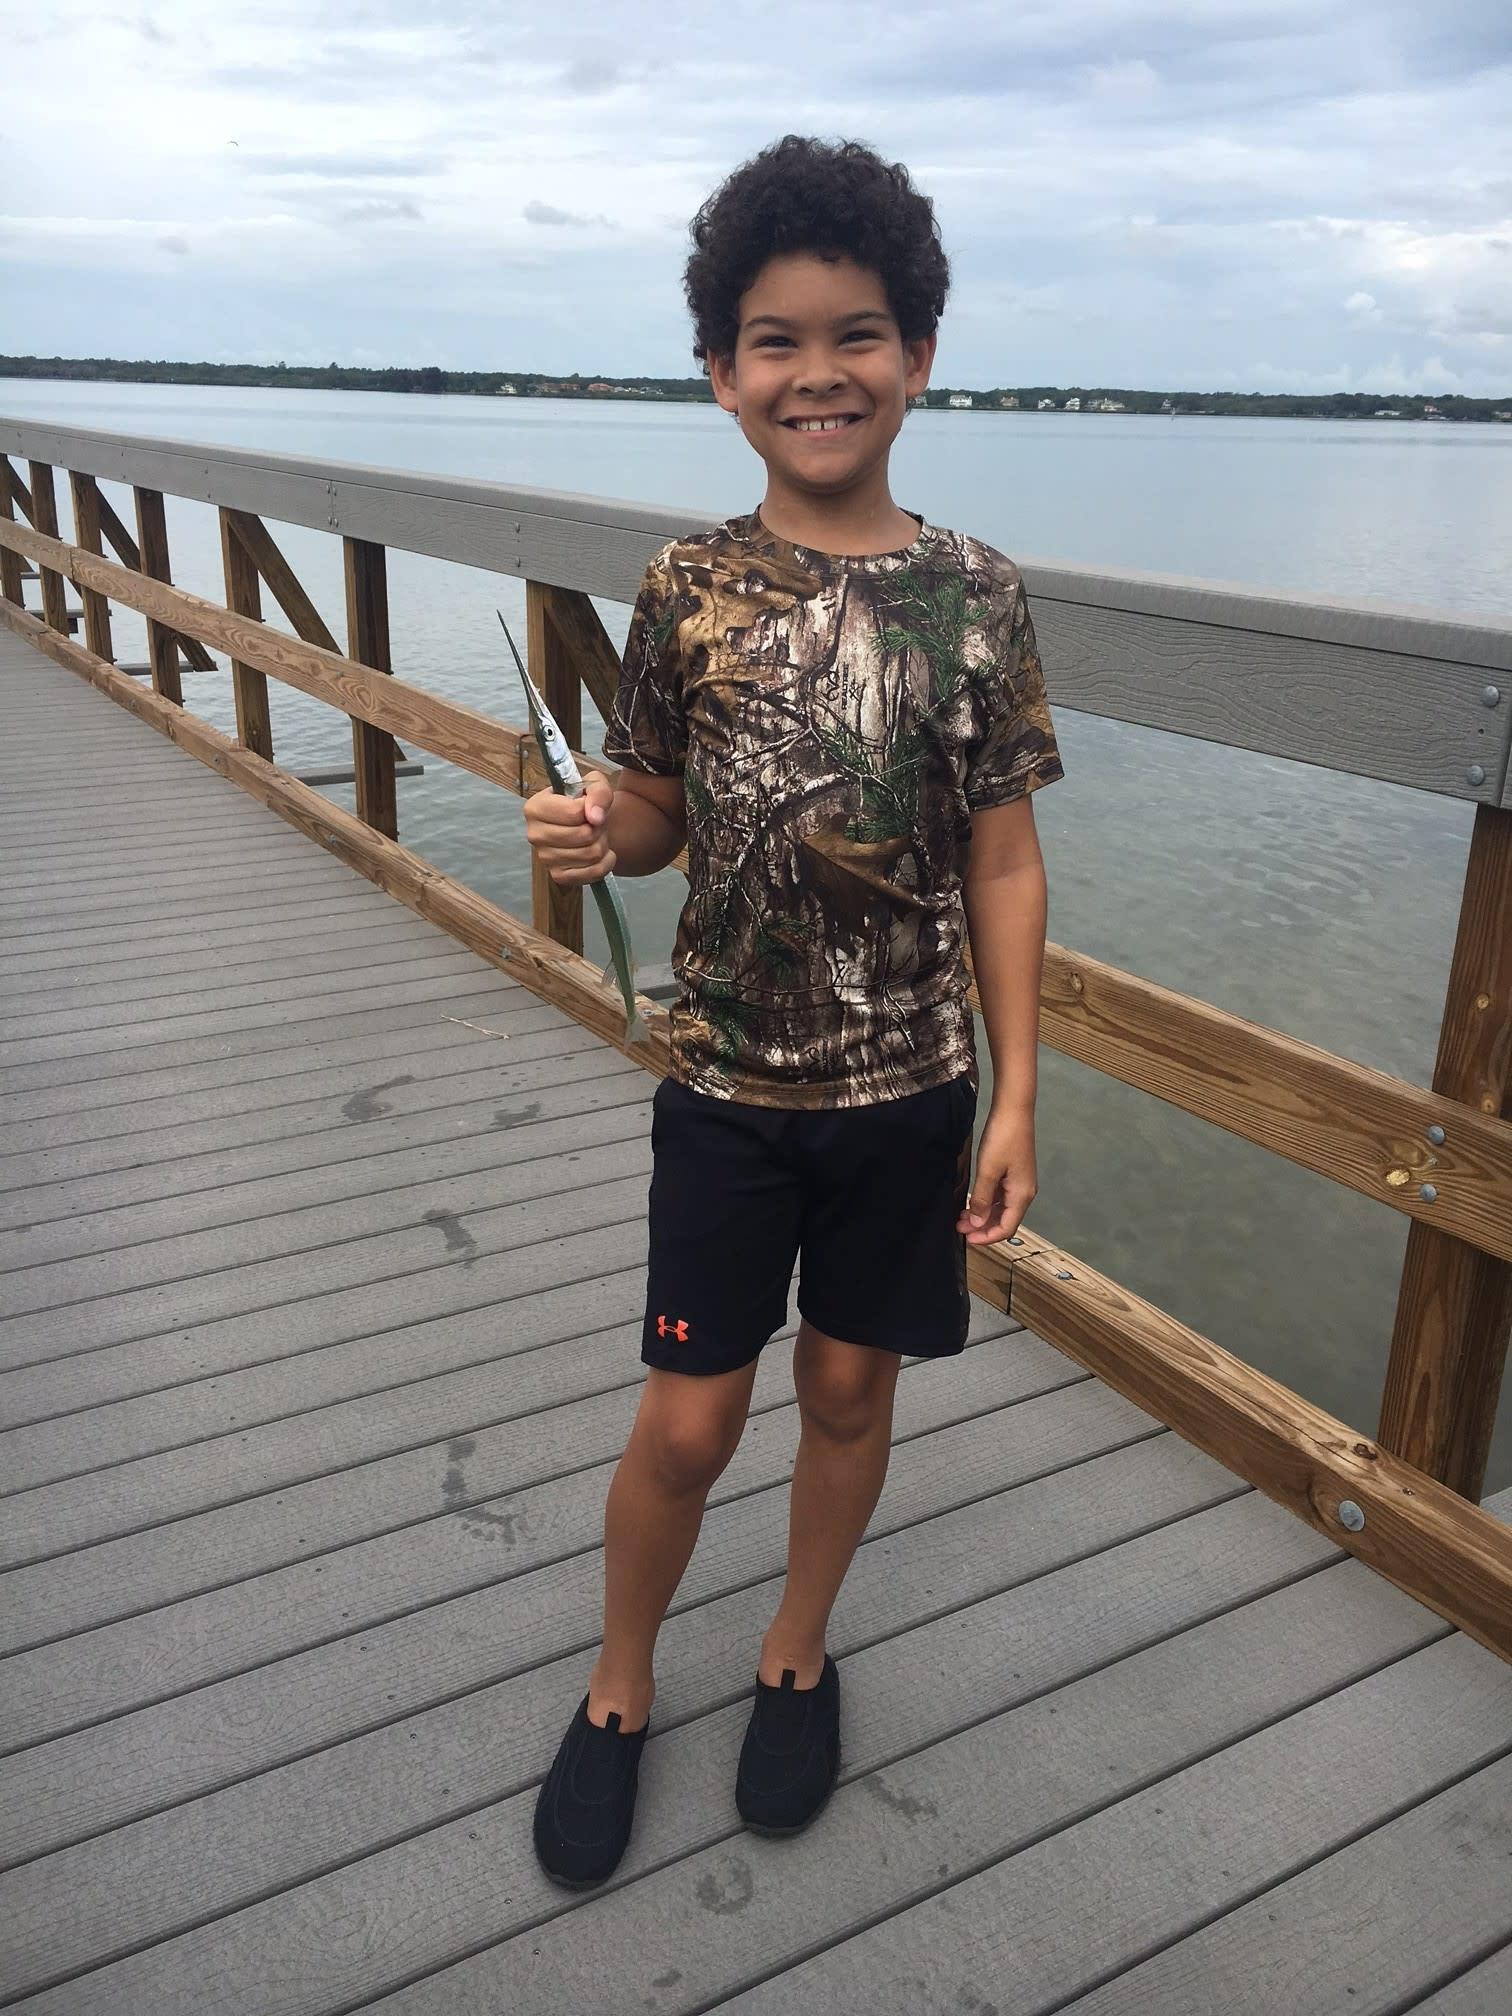 Bob Seymour Jr. Memorial Kids Fishing Derby